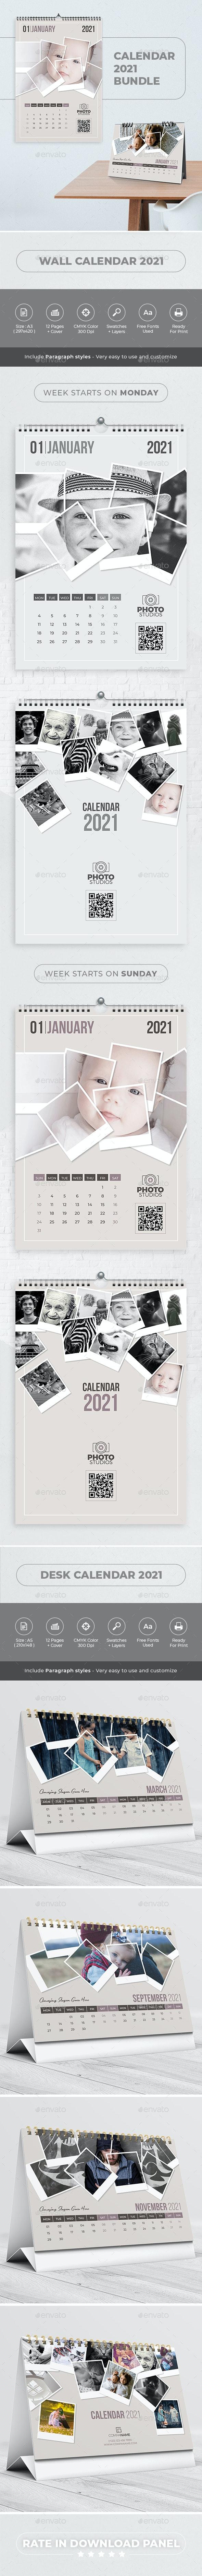 Calendar 2021. Polaroid Photo Bundle V04 - Calendars Stationery